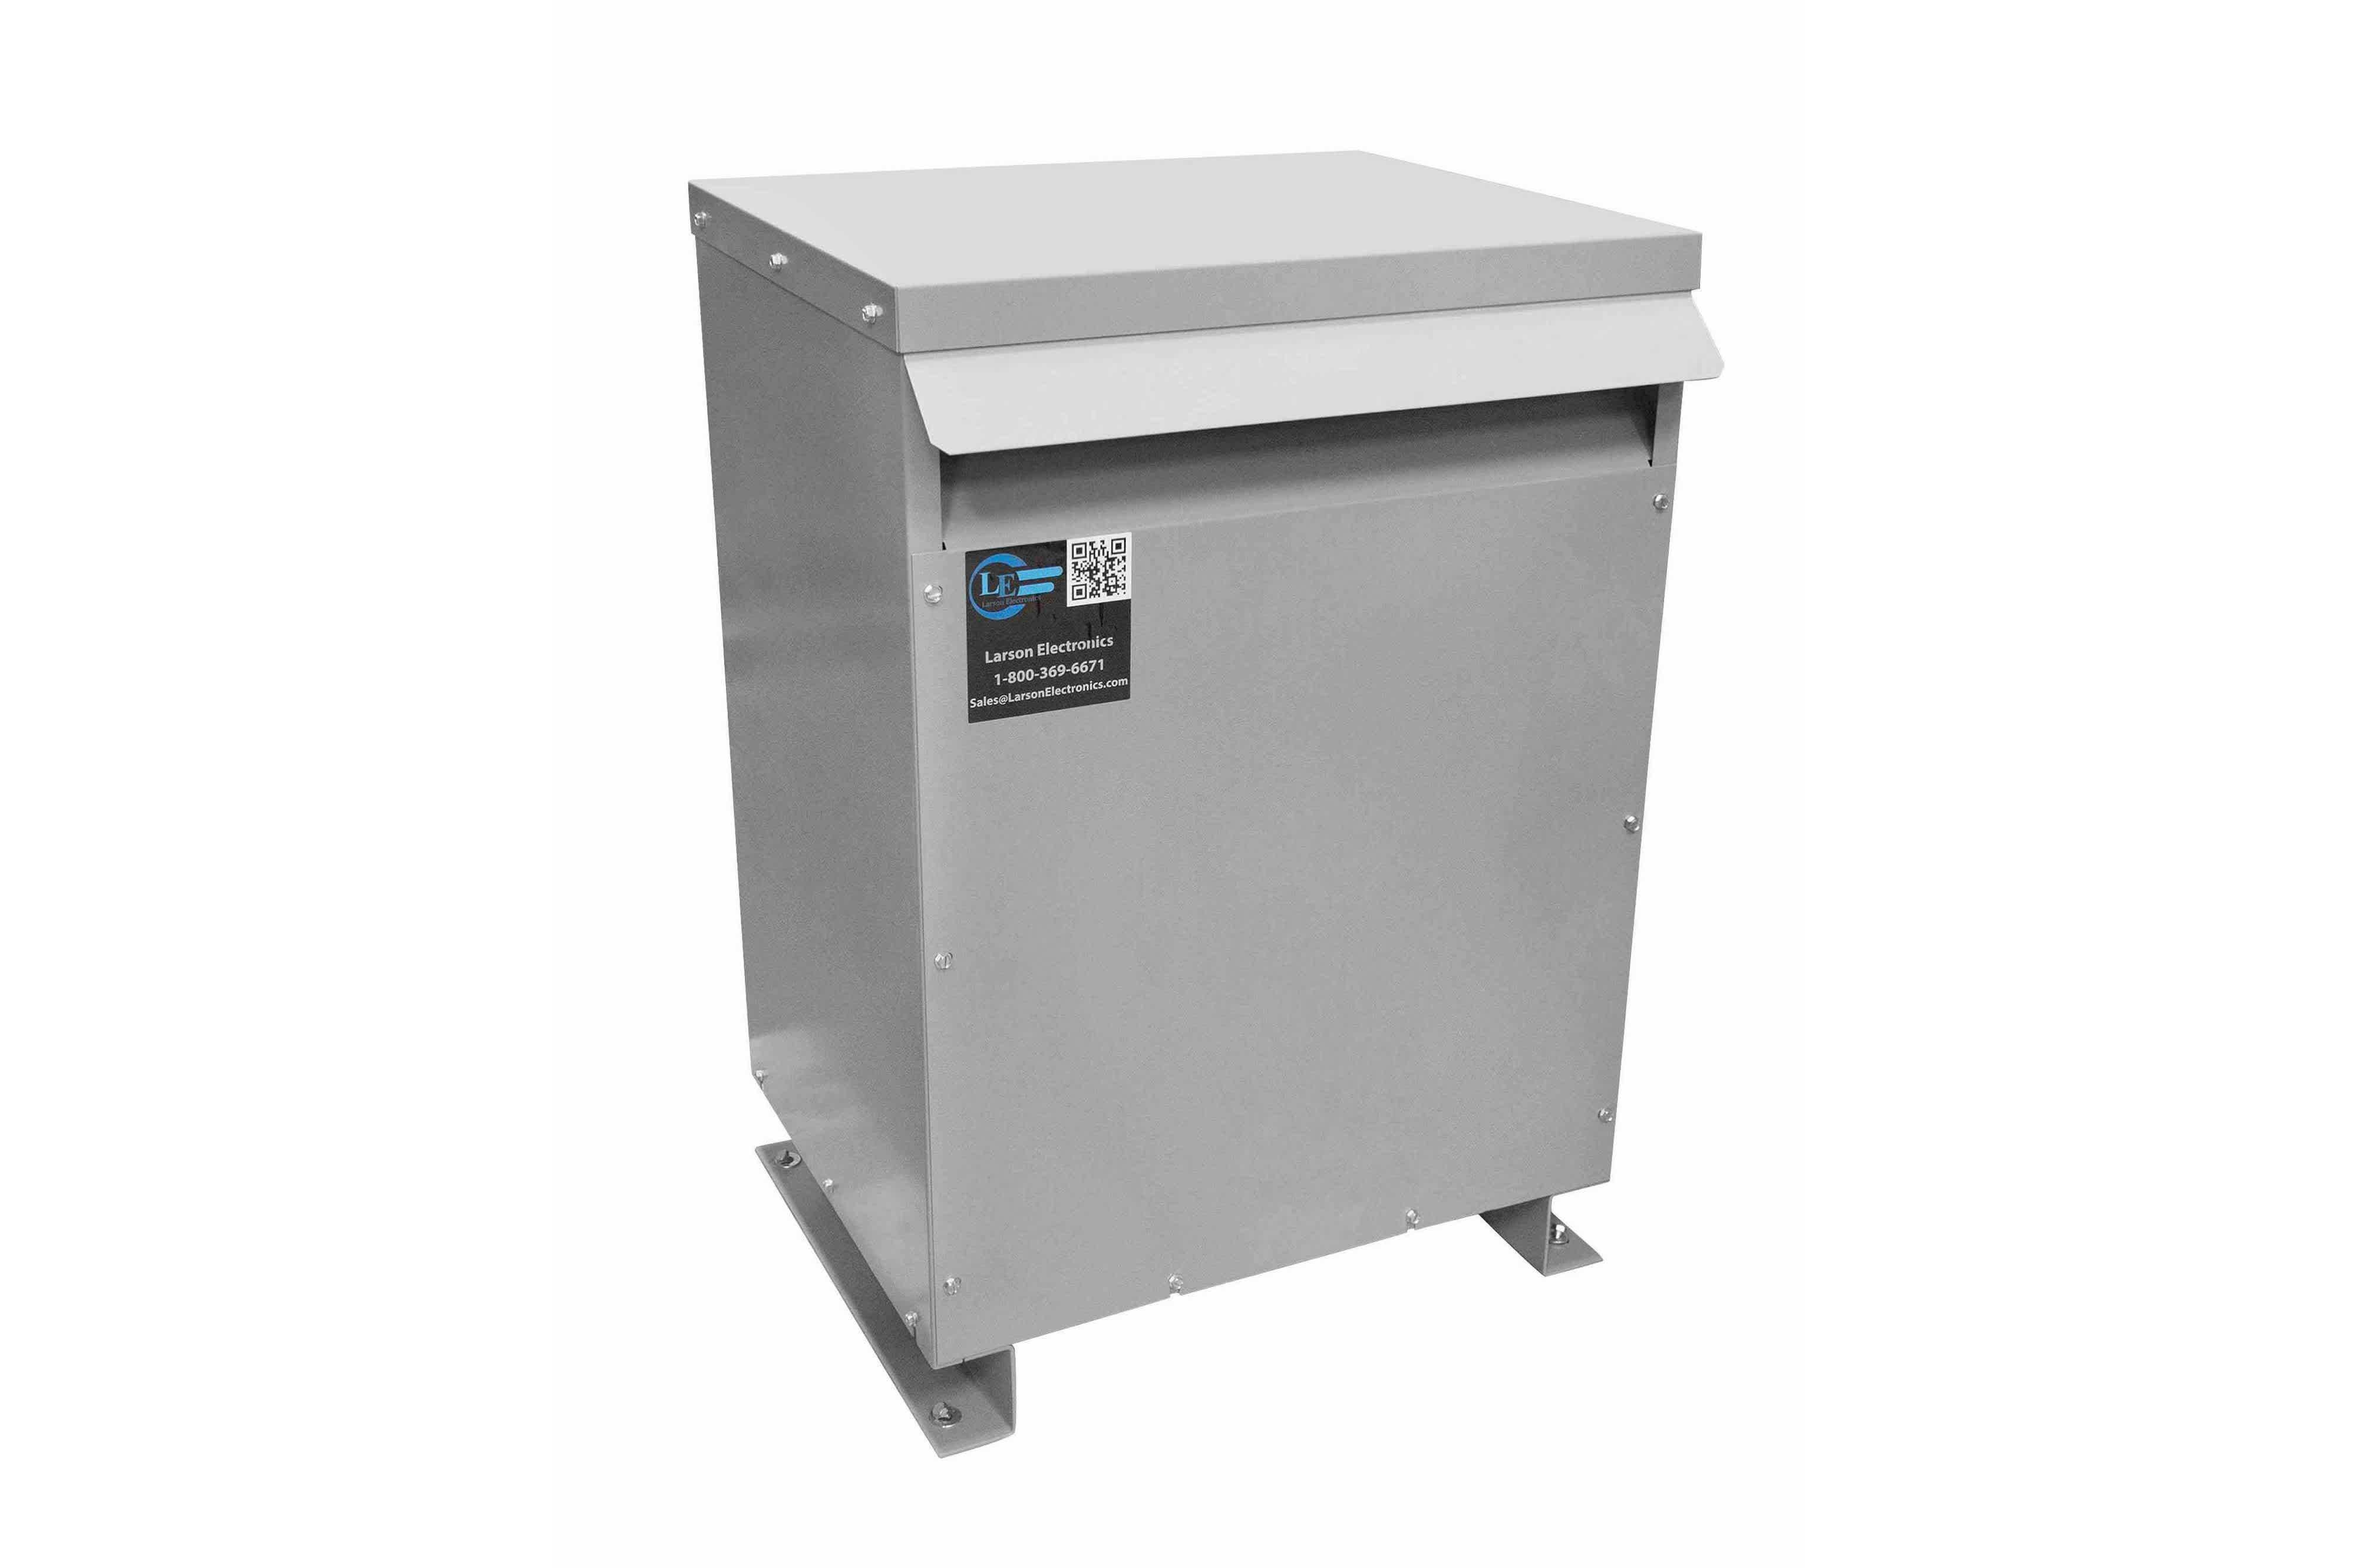 750 kVA 3PH Isolation Transformer, 480V Wye Primary, 240V Delta Secondary, N3R, Ventilated, 60 Hz